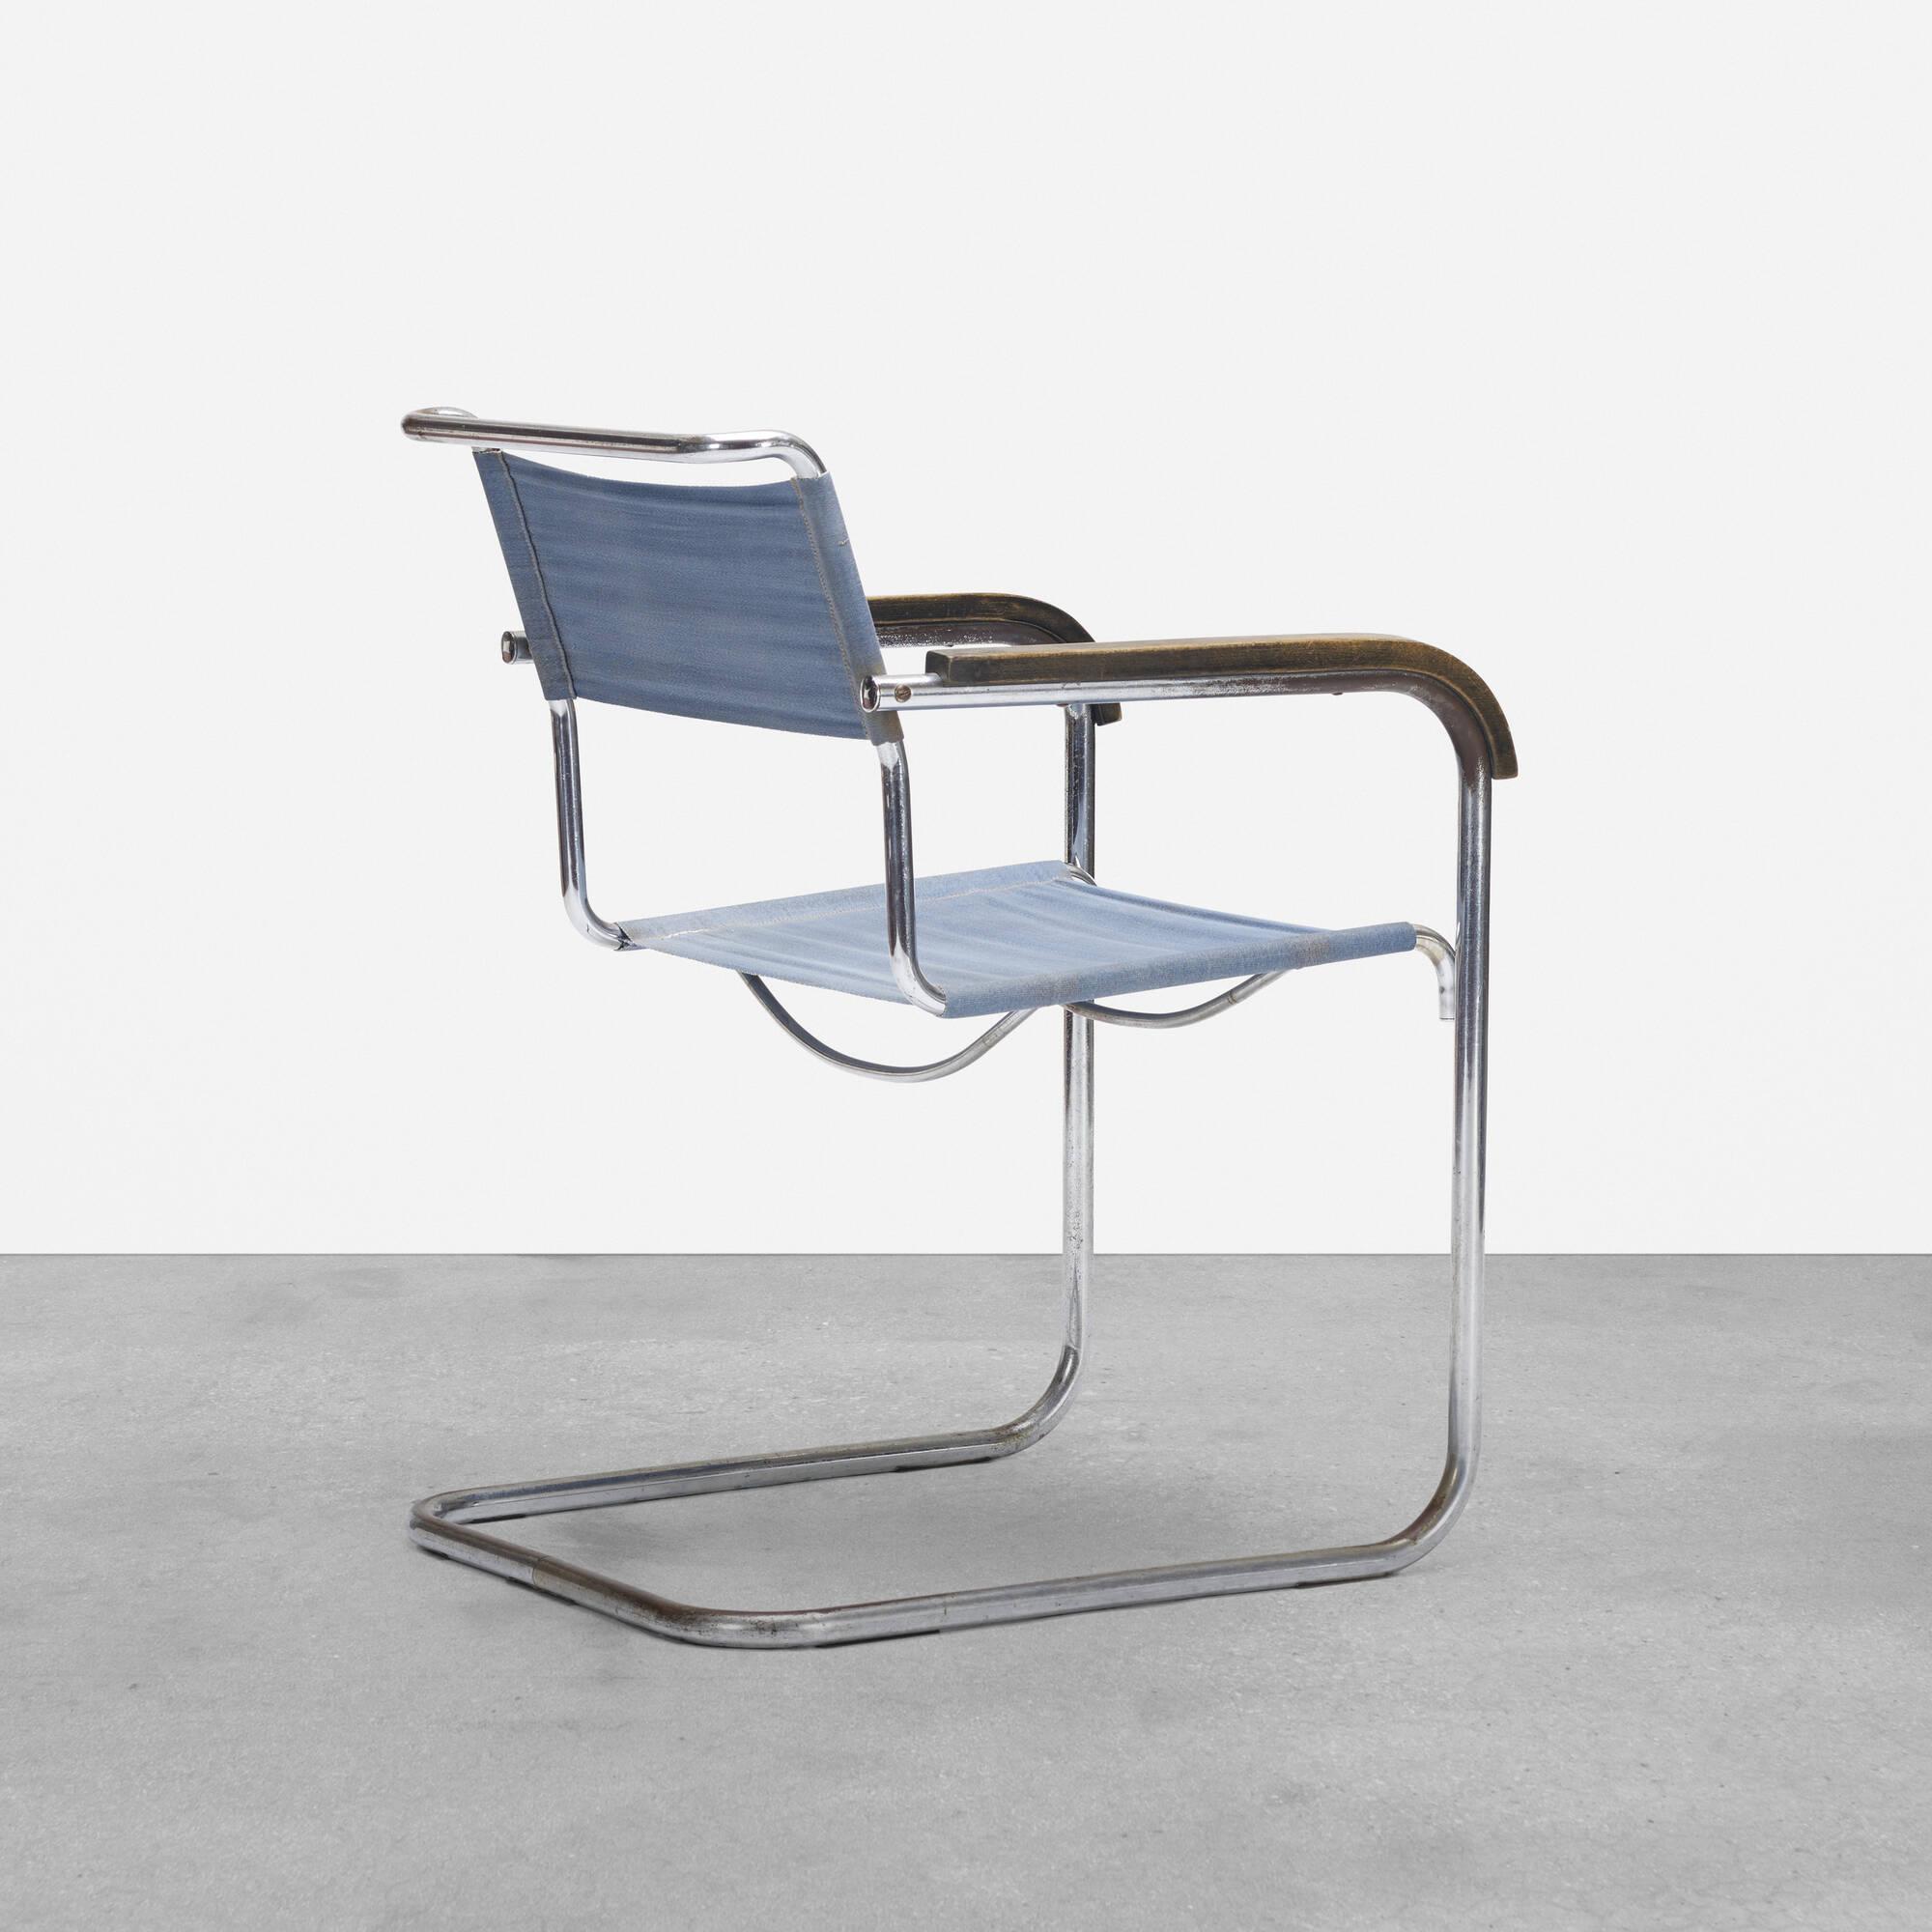 149: Marcel Breuer / armchair, model B32 (1 of 4)